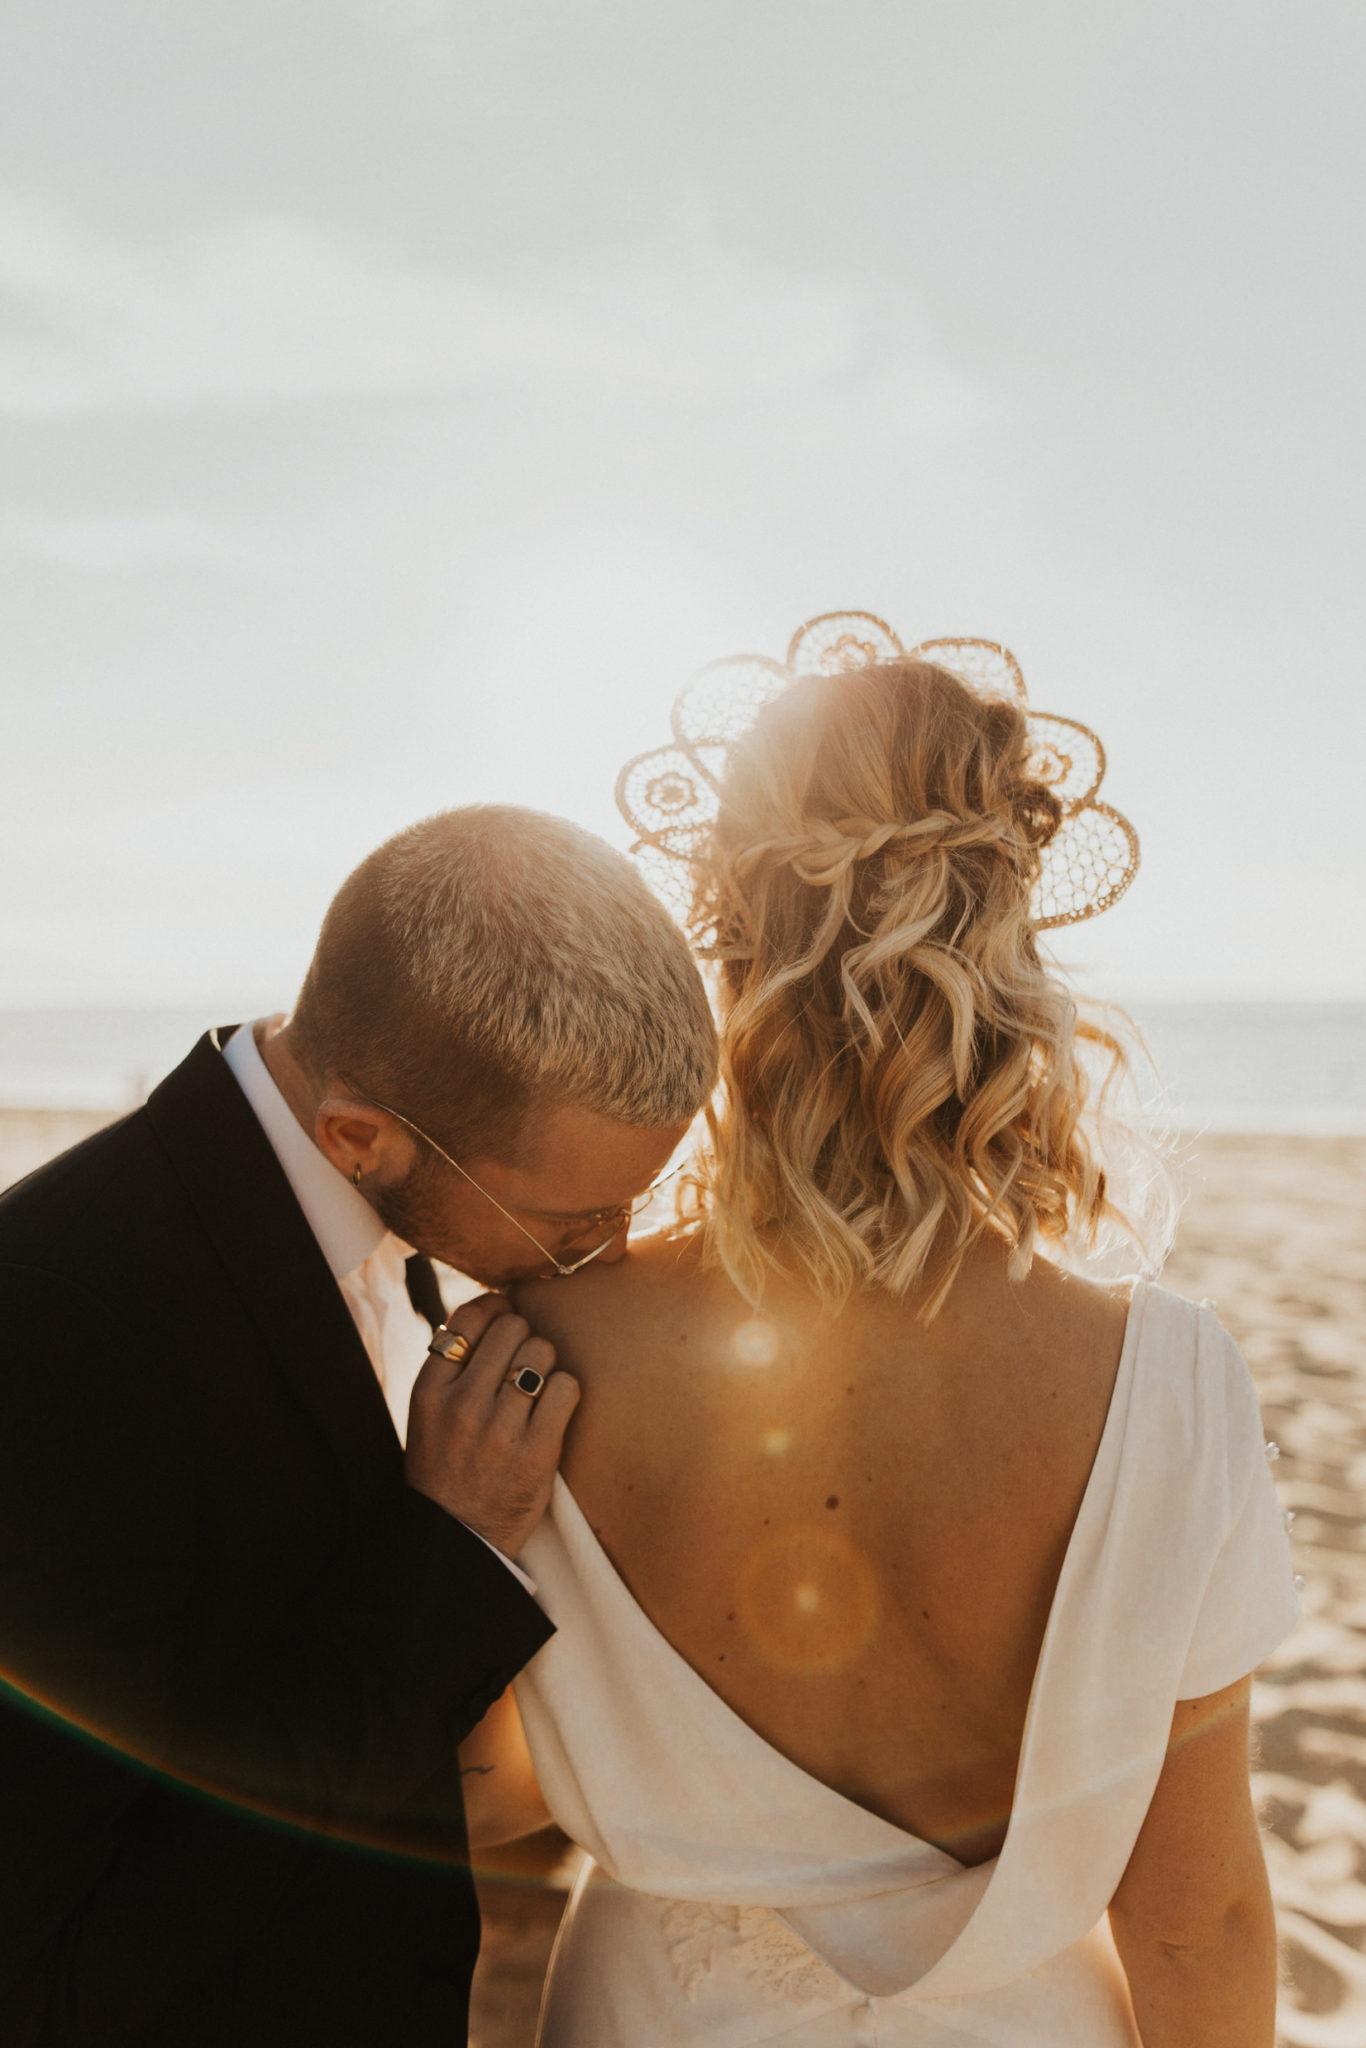 bassin-arcachon-mariage-inspiration-couple-amour